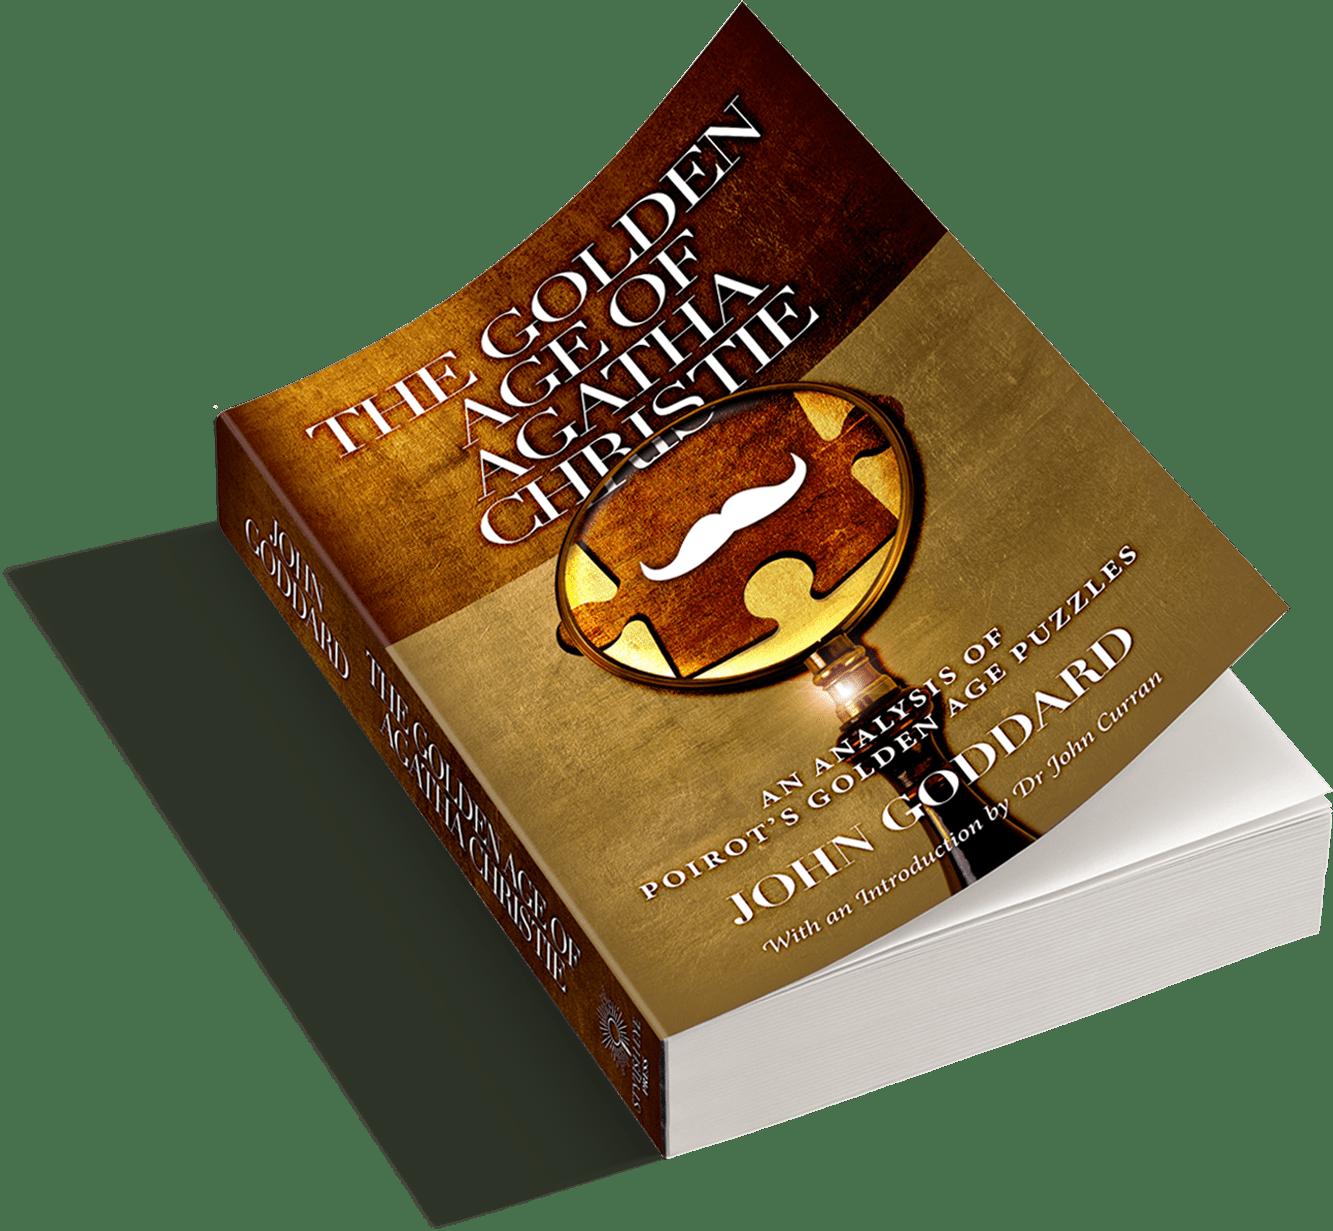 Agatha Christie's Golden Age Volume I Paperback Edition